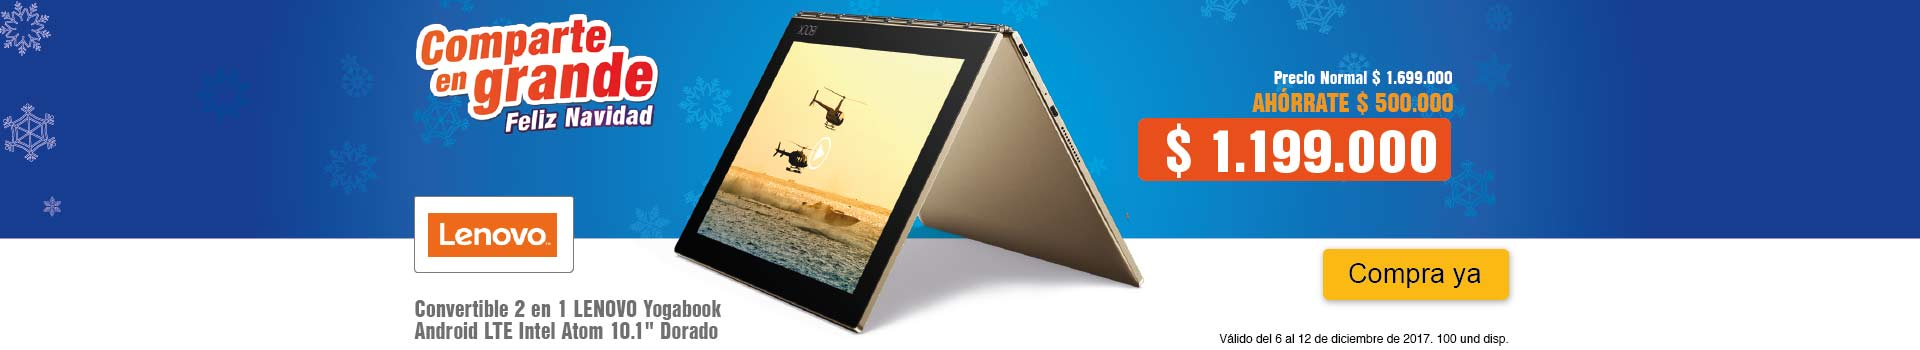 CAT AK-KT-1-computadores-Convertible 2 en 1 LENOVO - Yogabook Android LTE Intel Atom 10.1